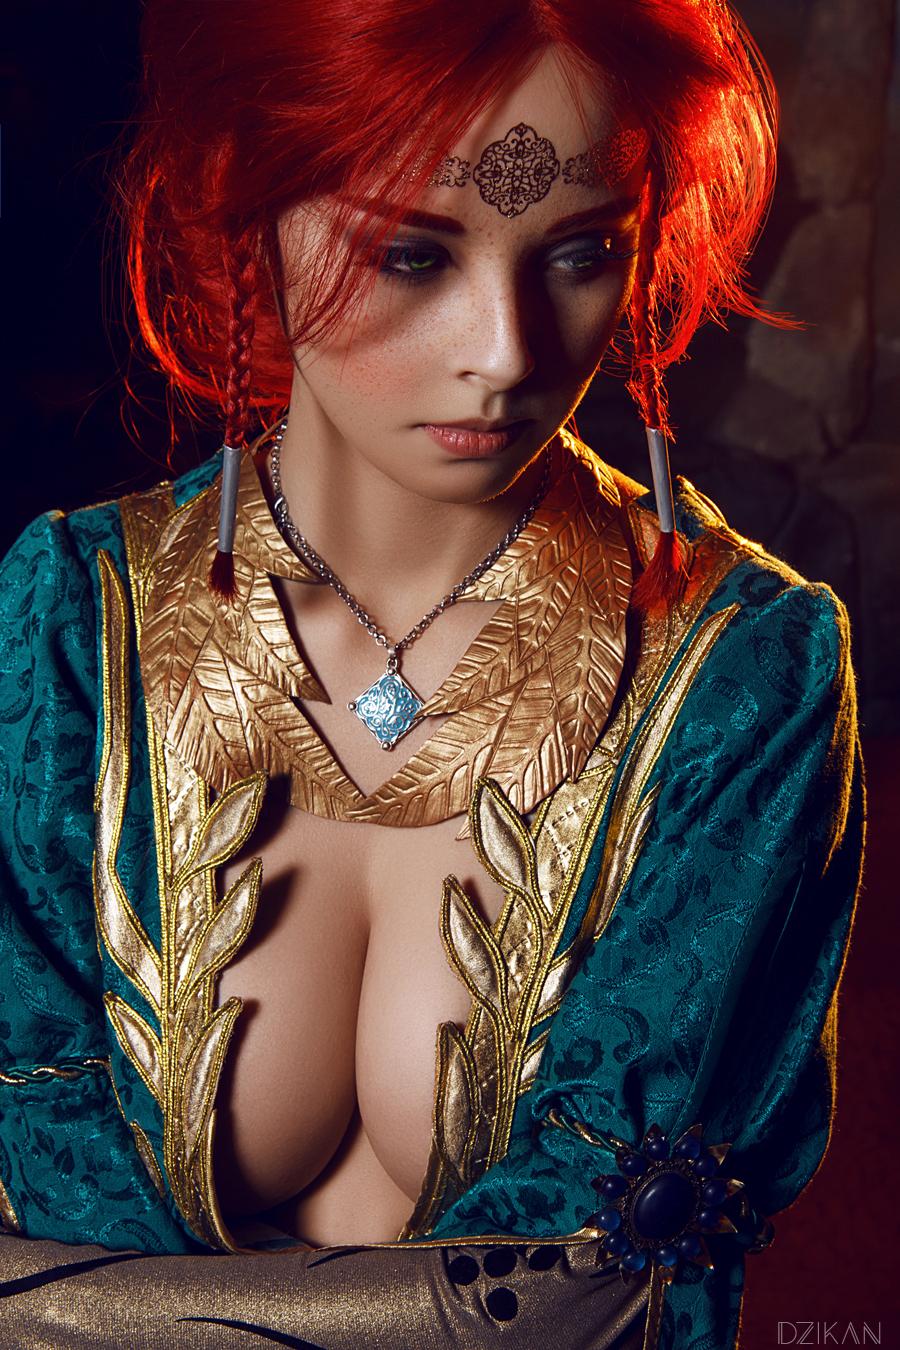 sexy triss merigold cosplay